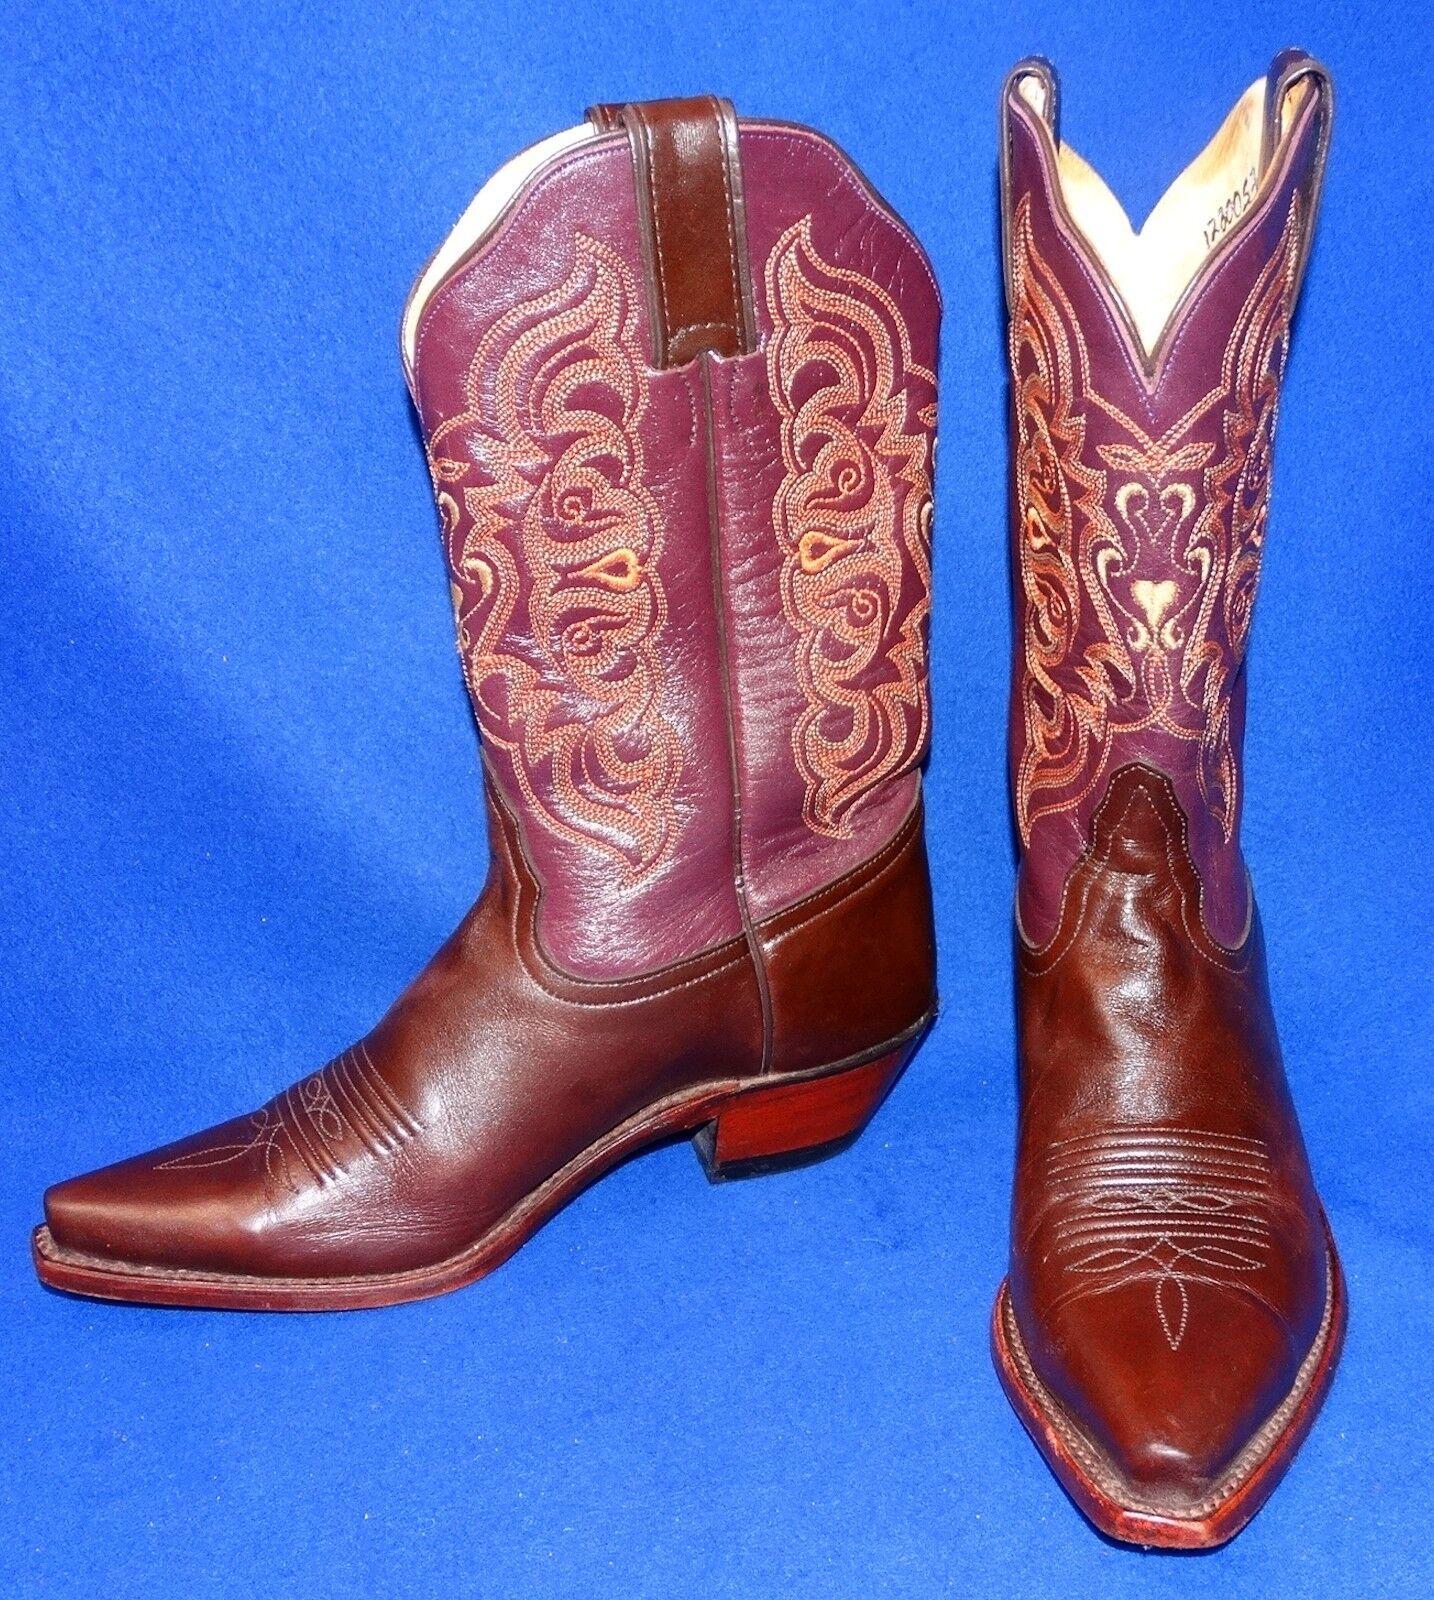 GREAT 7 B TONY LAMA COGNAC BURGUNDY CALF WOMEN COWBOY BOOTS